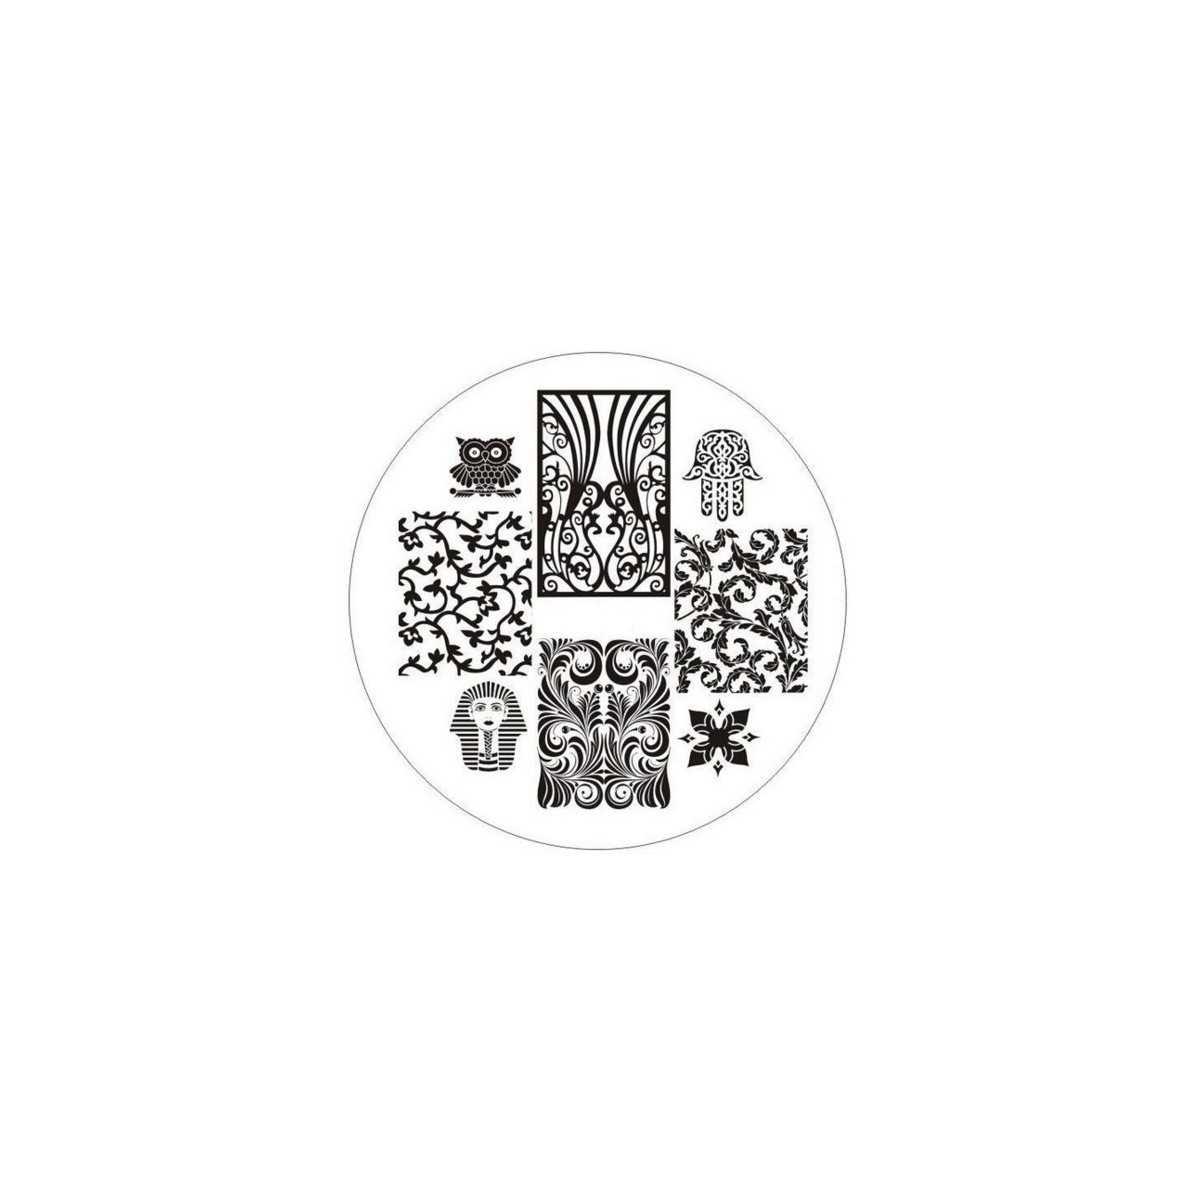 https://www.kit-manucure.com/1069-thickbox_default/plaque-de-stamping-main-de-fatma-végétation-arabesque-pharaon-hibou.jpg